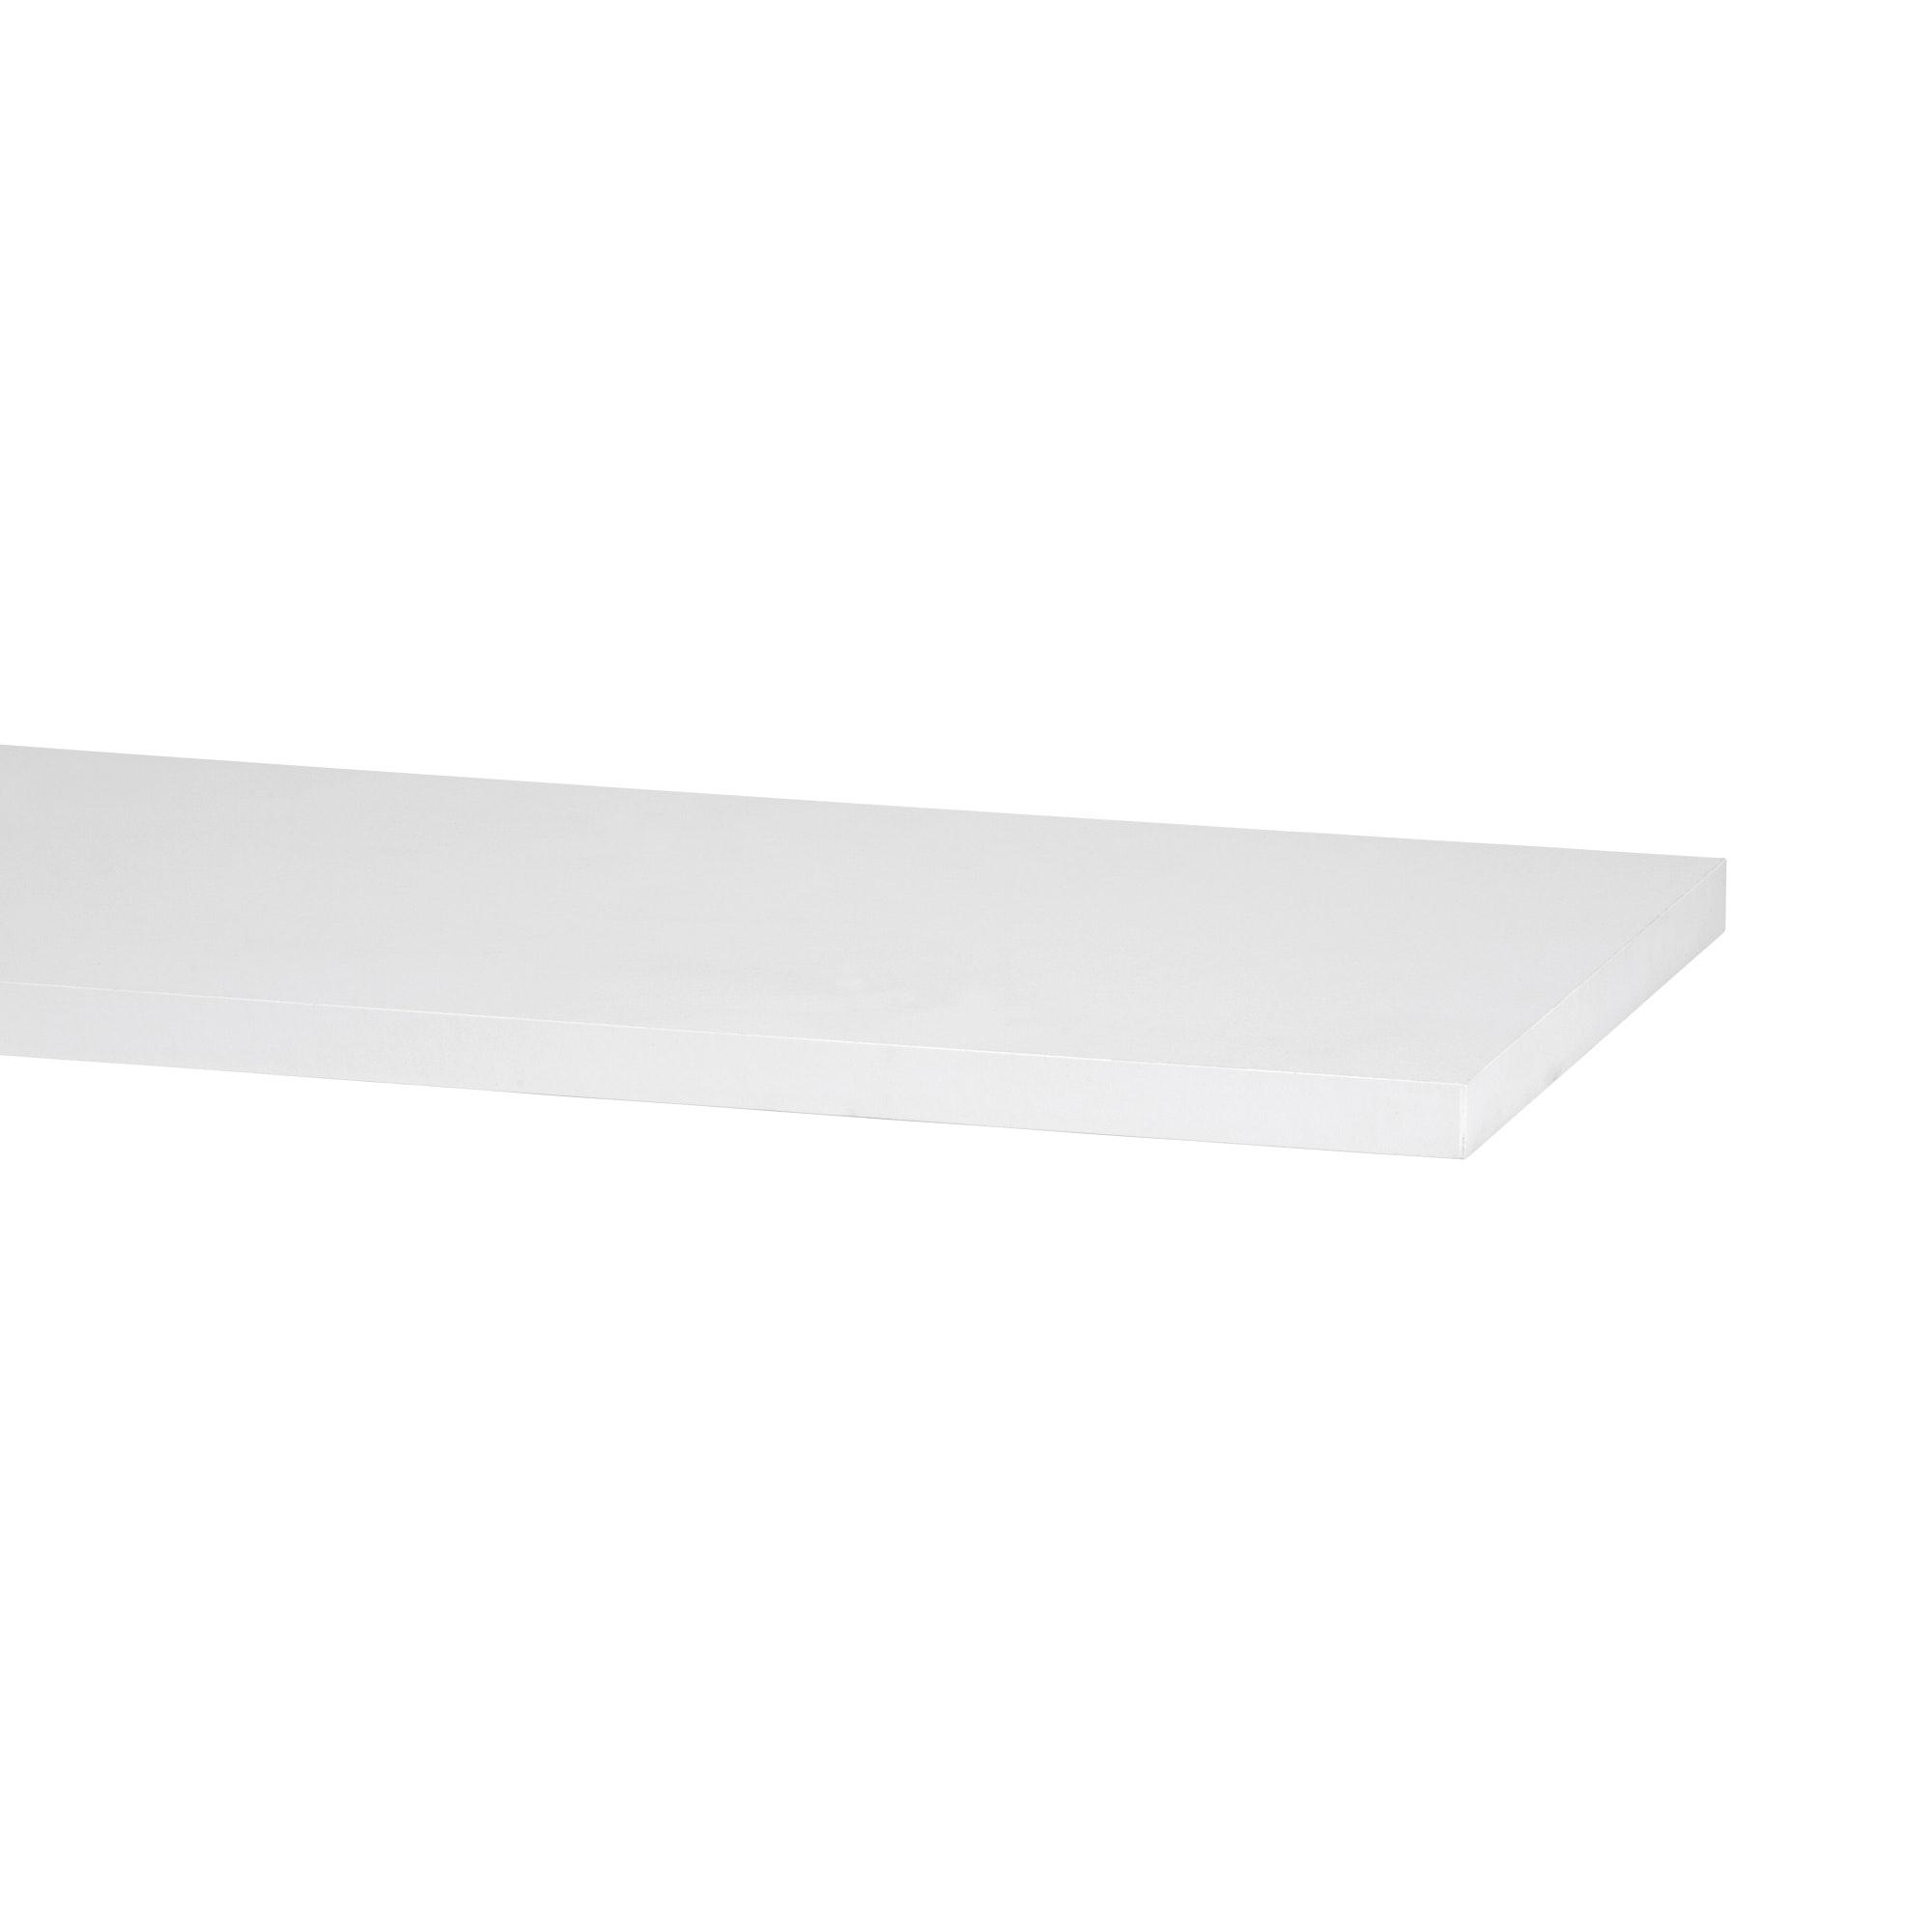 Hyllplan Elfa Melamin 1800X250X19mm vit430910